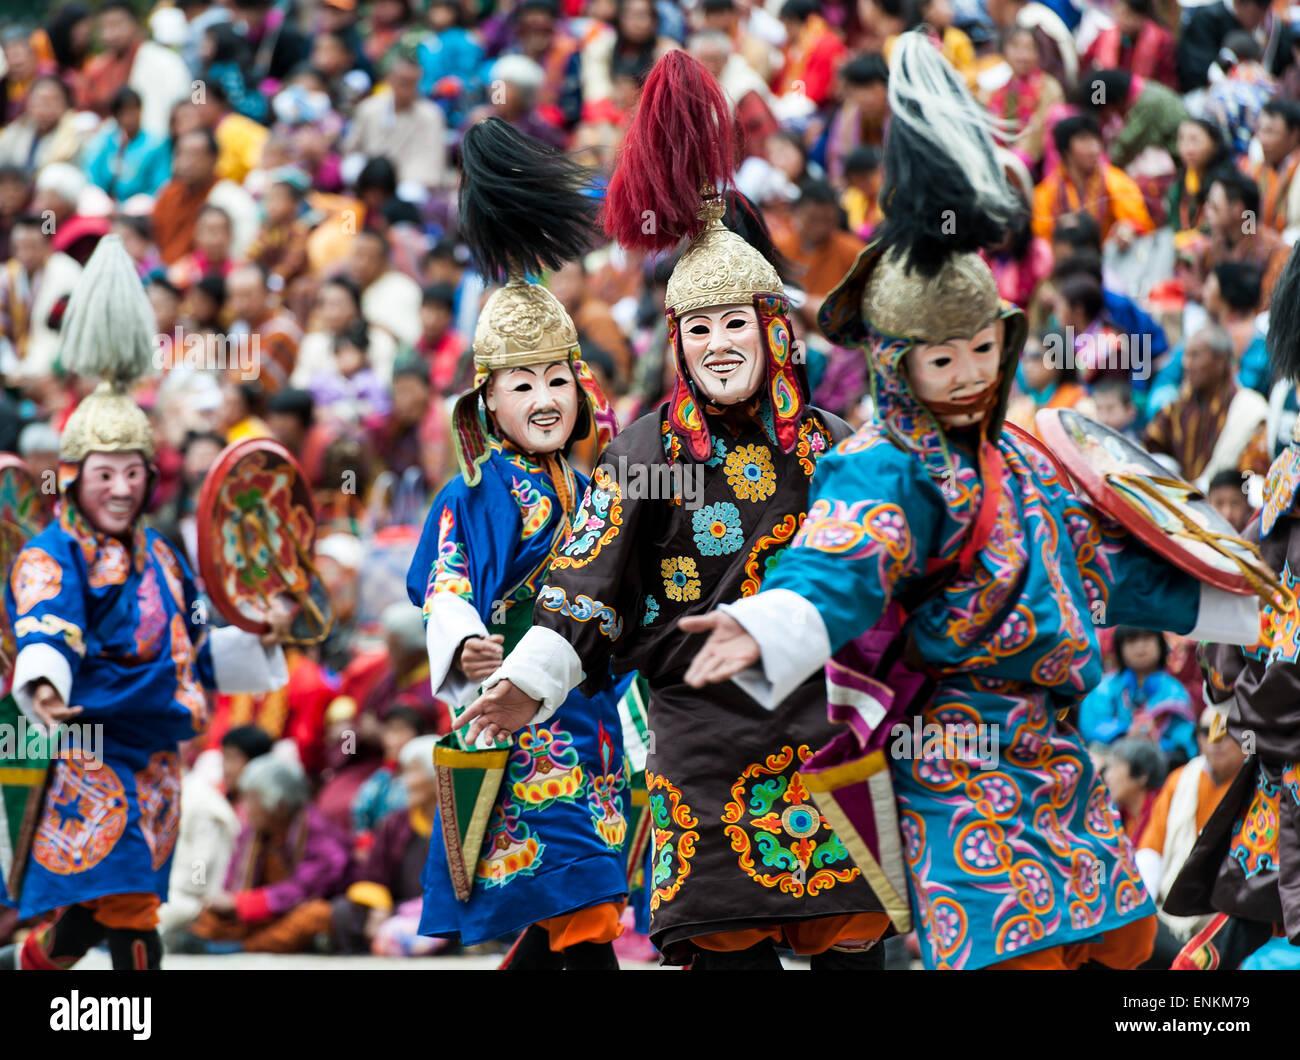 Dancers performing at Paro religious festival Bhutan - Stock Image